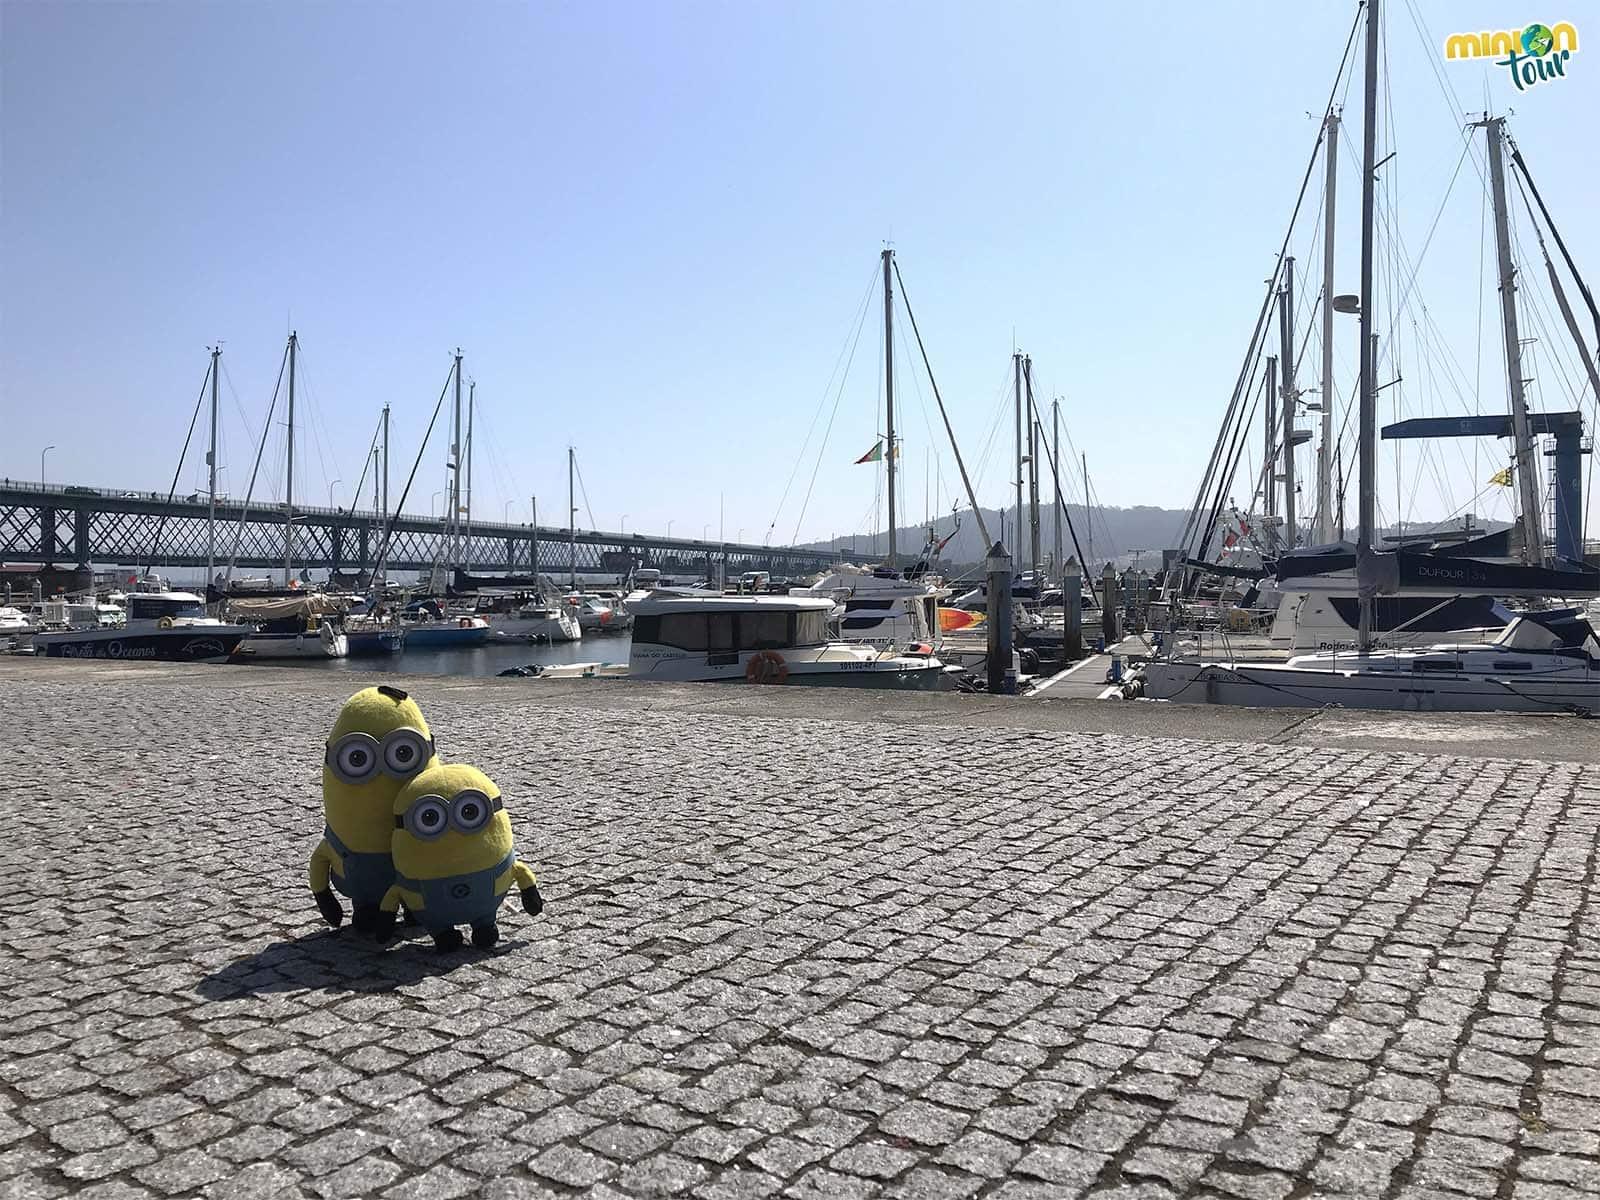 2 Minions preparados para empezar a recorrer Viana do Castelo